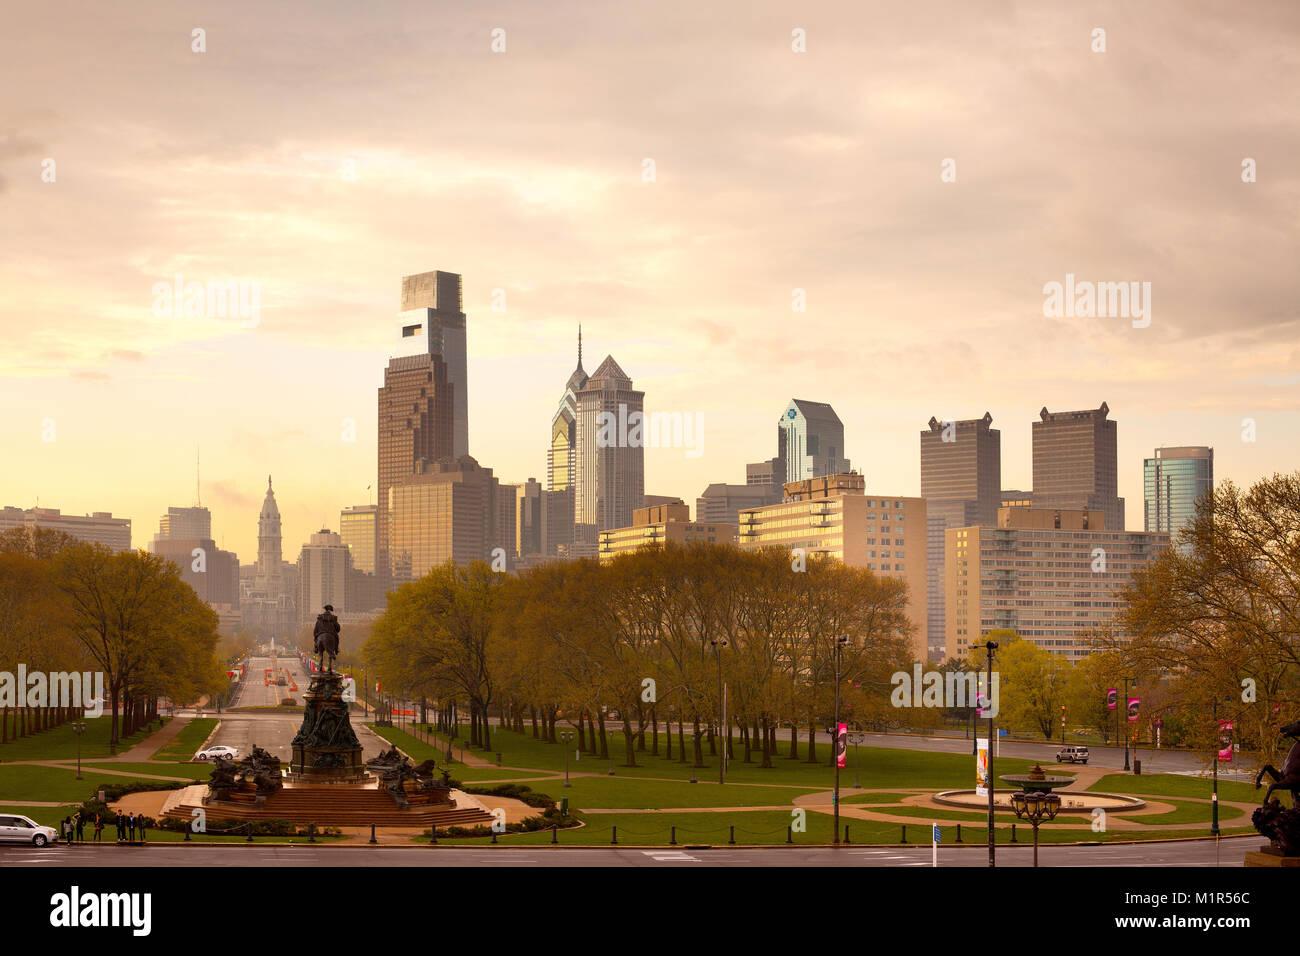 Philadelphia, Pennsylvania, USA - Downtown skyline with City Hall on a rainy day. - Stock Image